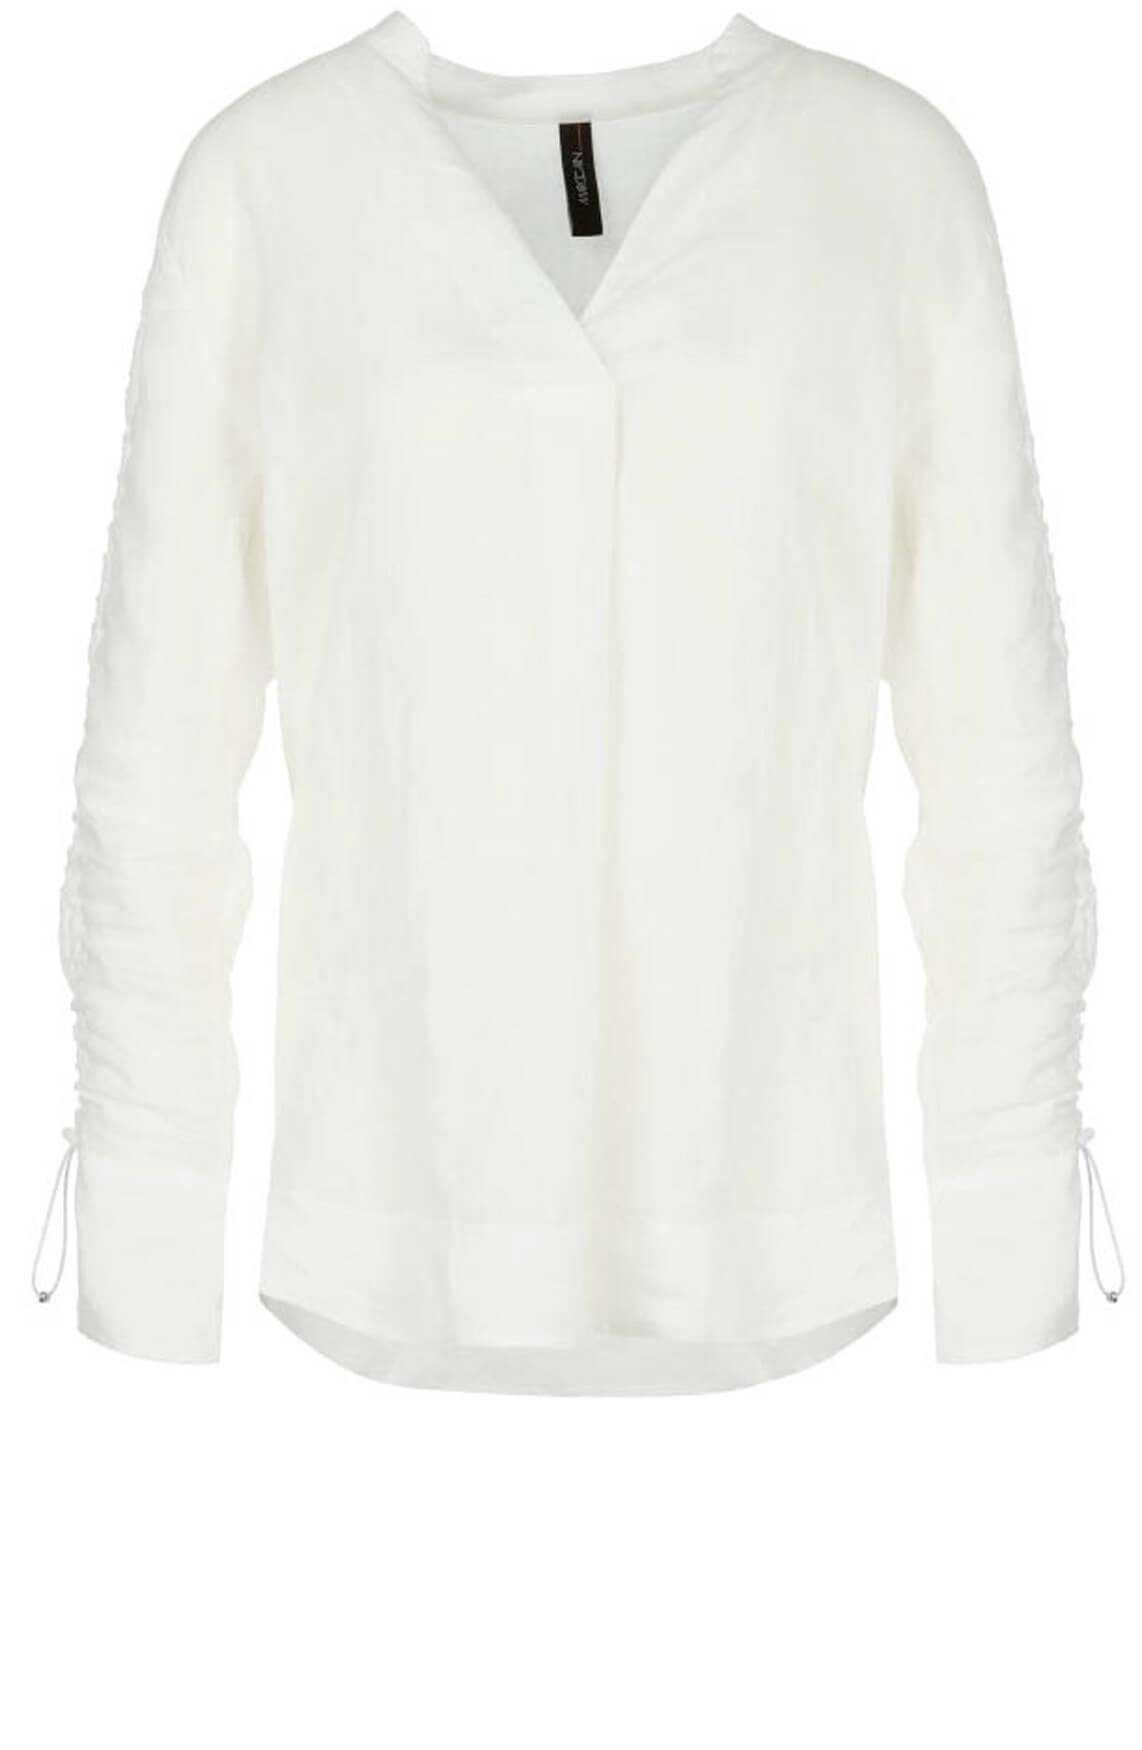 Marccain Sports Dames Lange linnen blouse wit